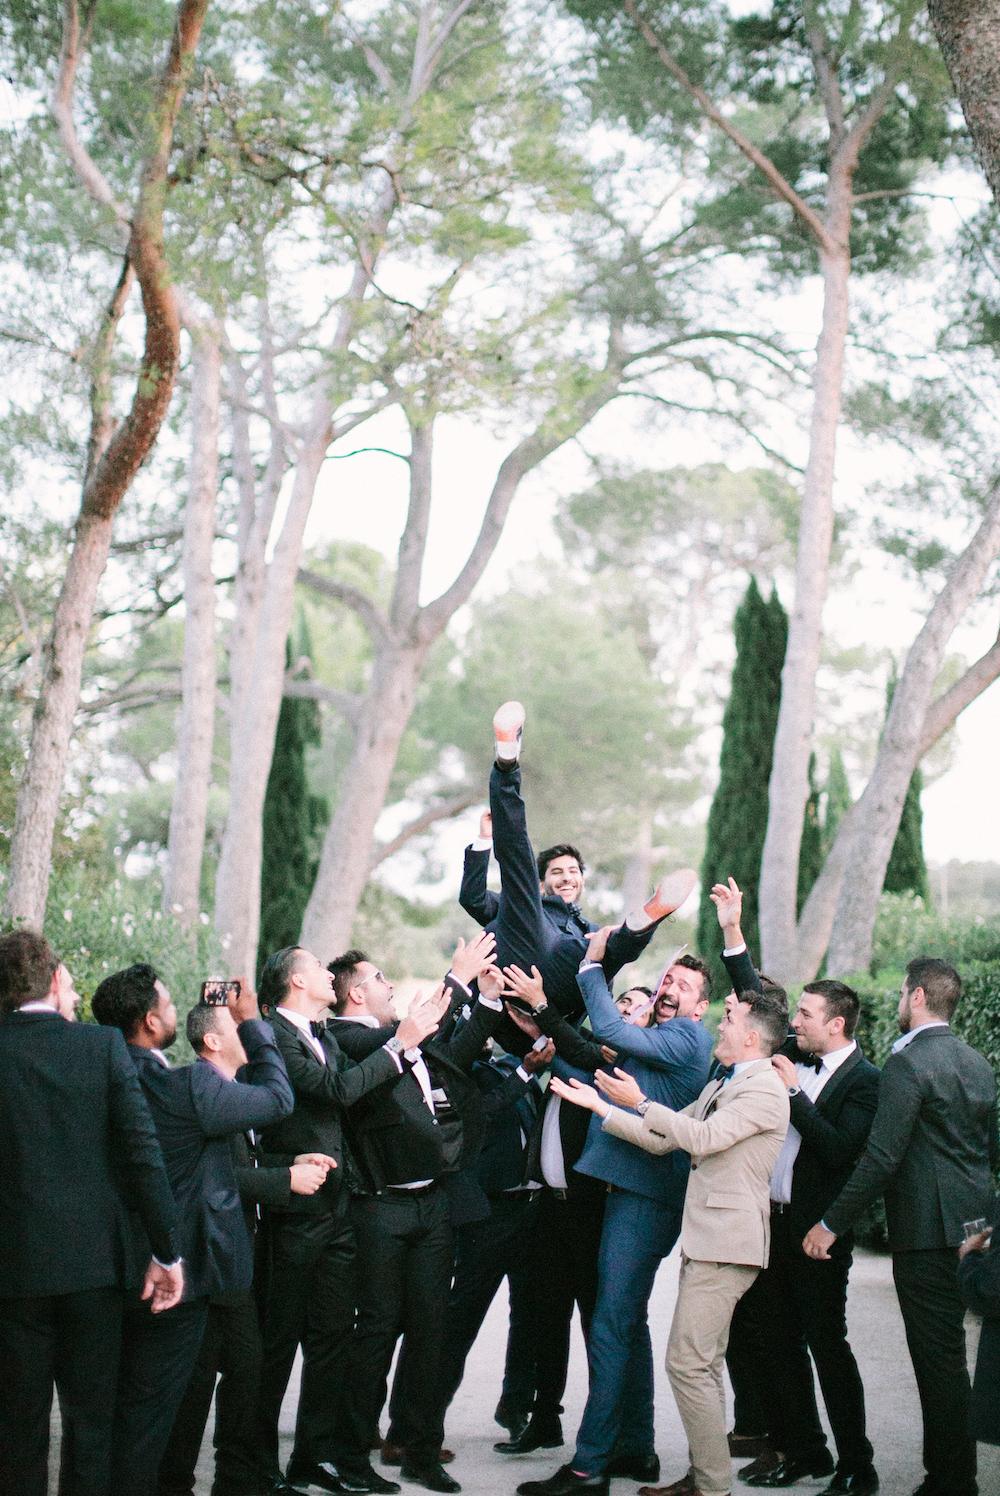 ©-saya-photography-studio-ohlala-wedding-photographer-photographe-mariage-chateau-de-la-tour-vaucros-avignon-250.jpg